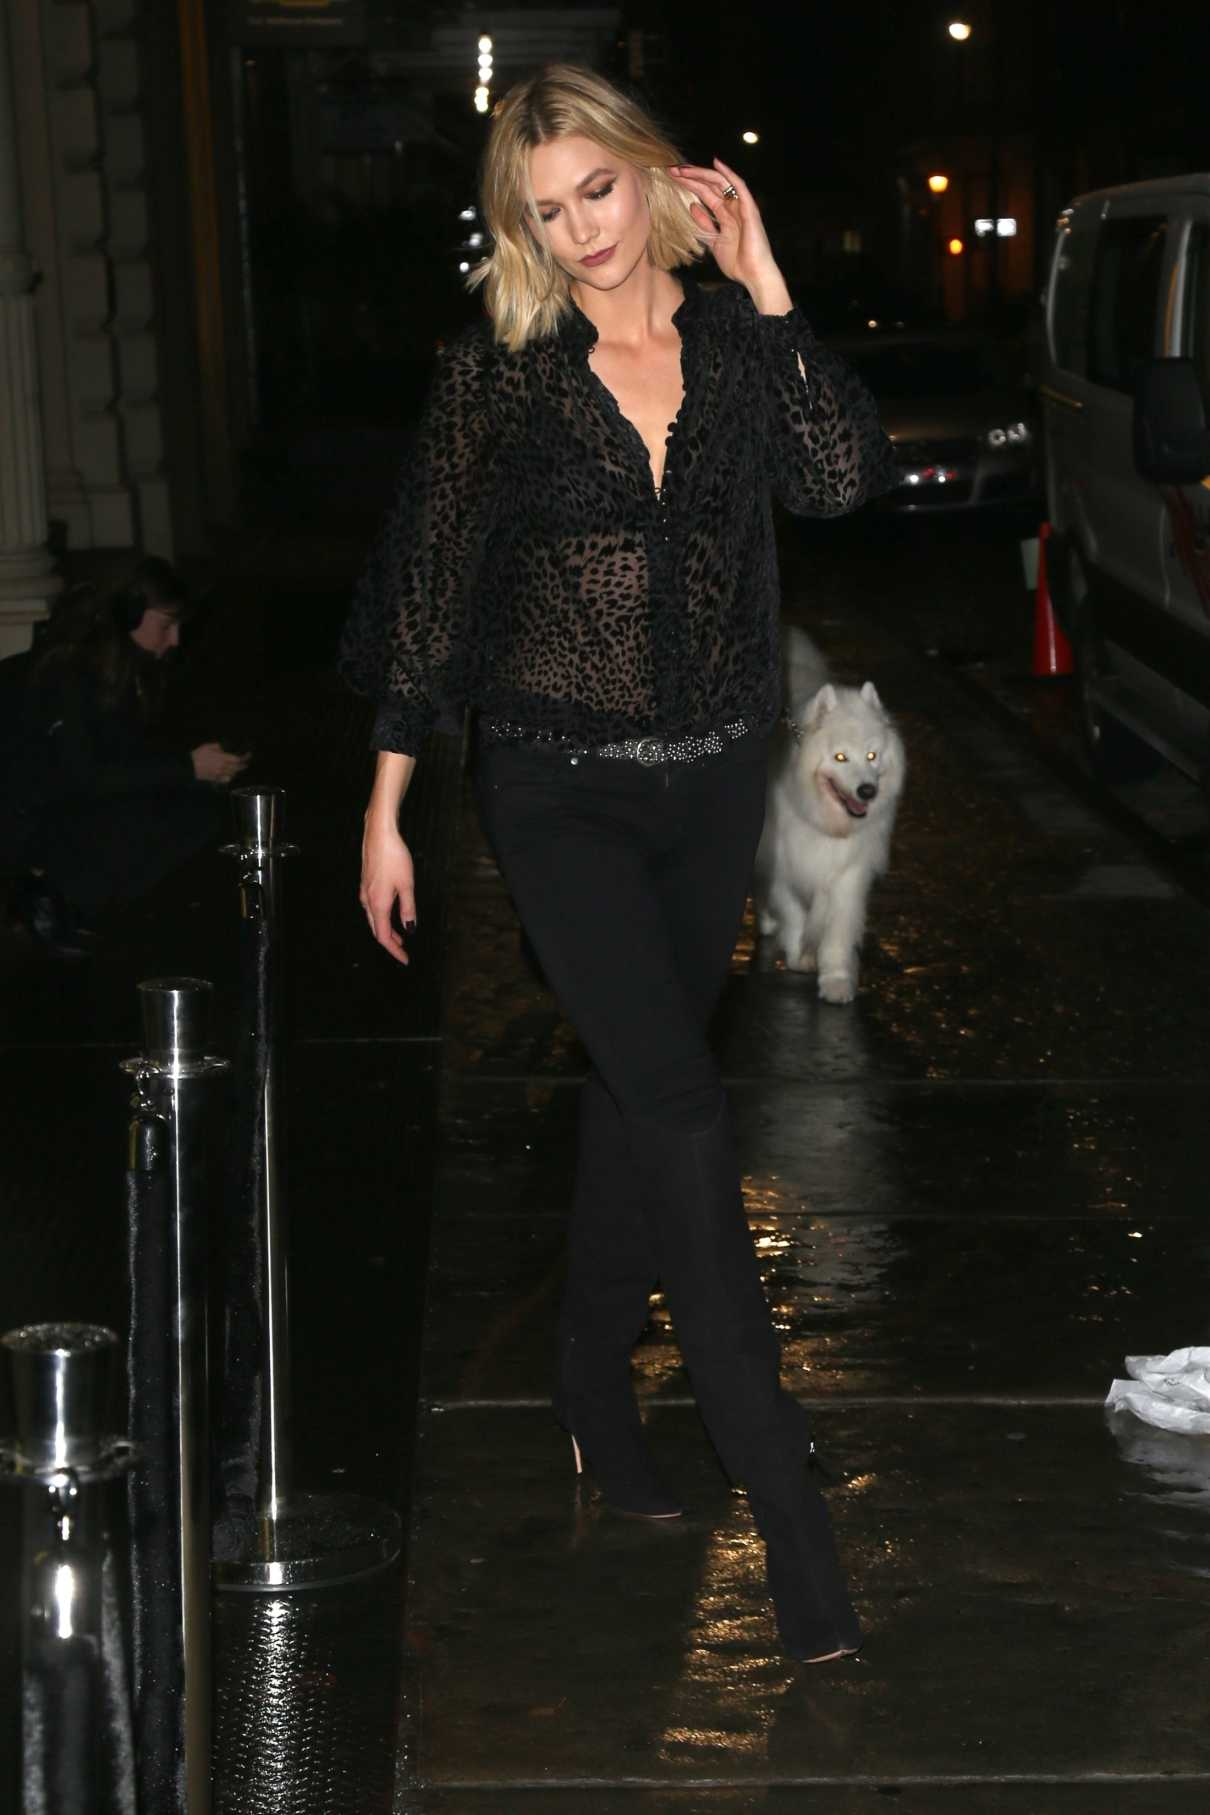 Karlie Kloss in a Black See-Through Blouse